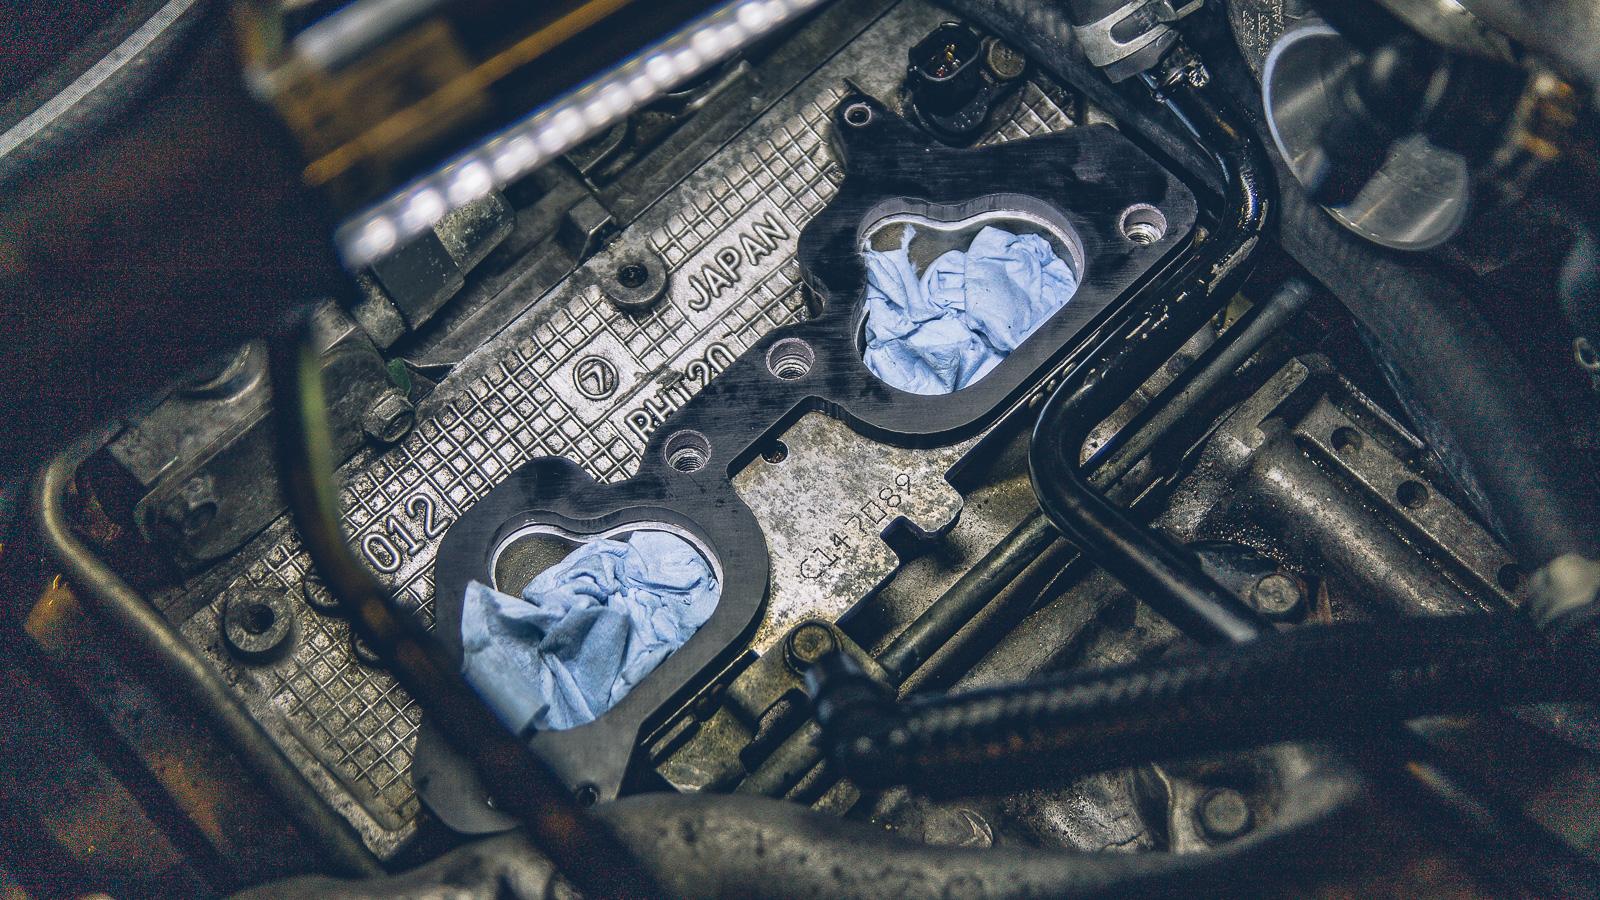 Install: KSTech 6.5mm Phenolic Intake Manifold Spacers